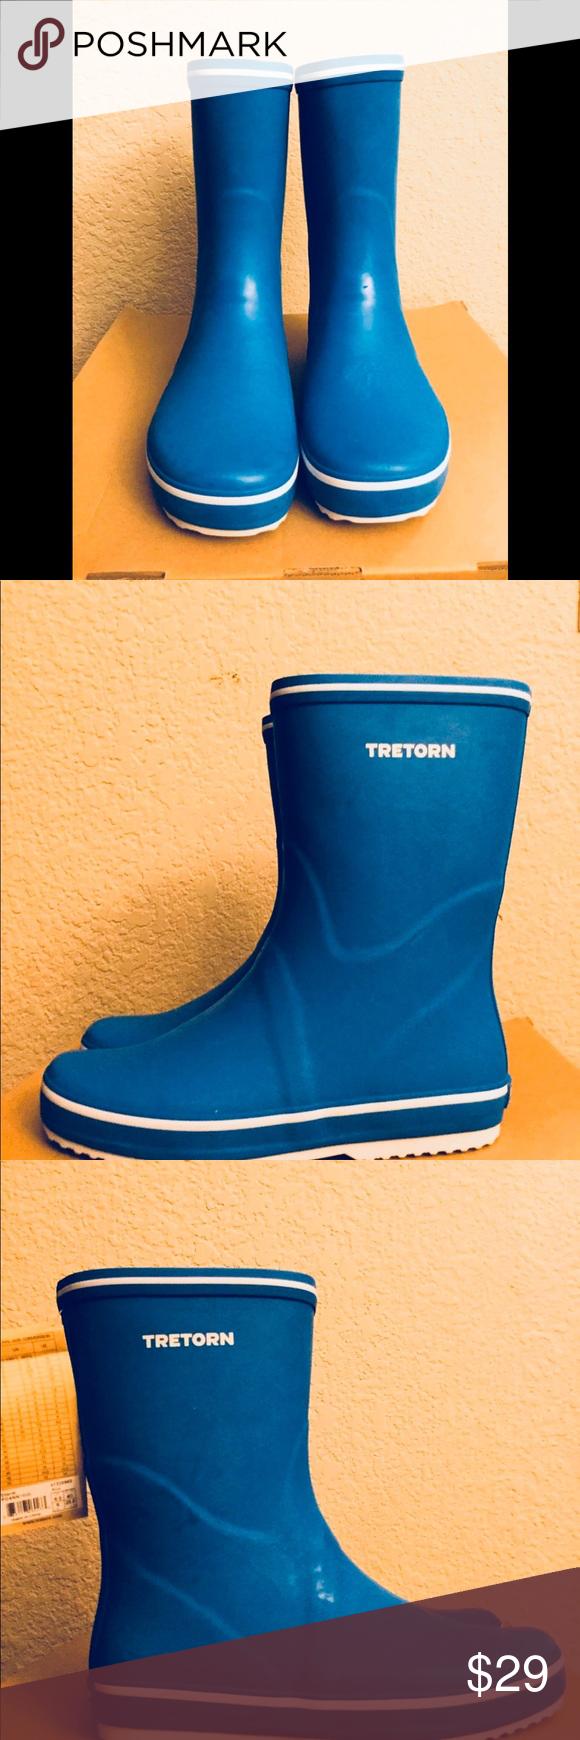 Tretorn Rain Boots For Women Rubber Boots New Rain Boots